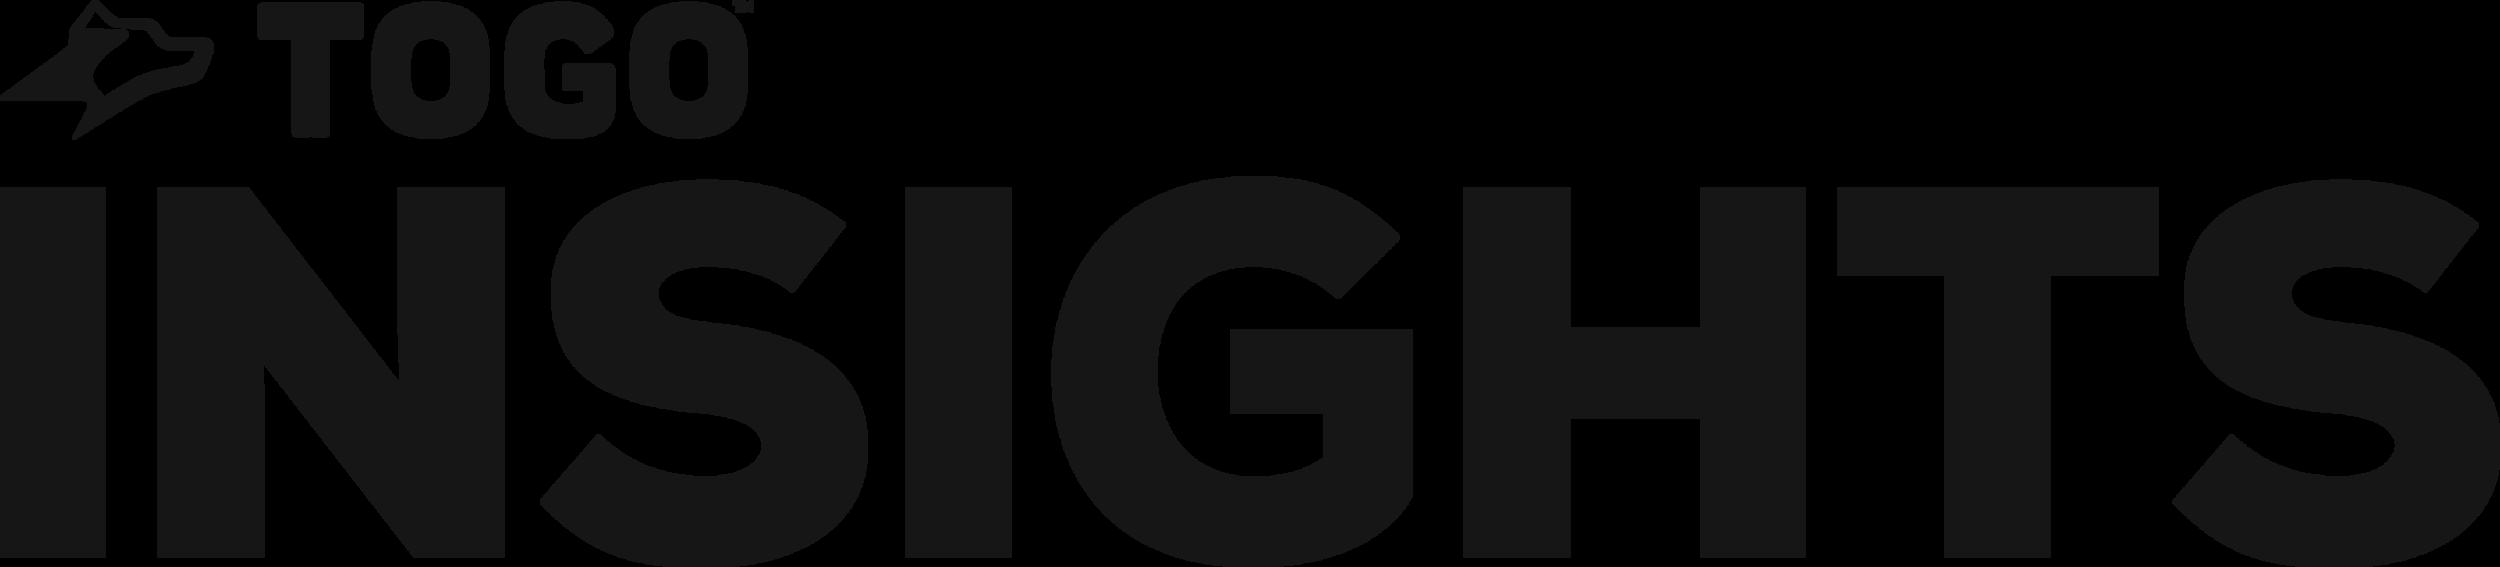 LOGO_Insights_black.png